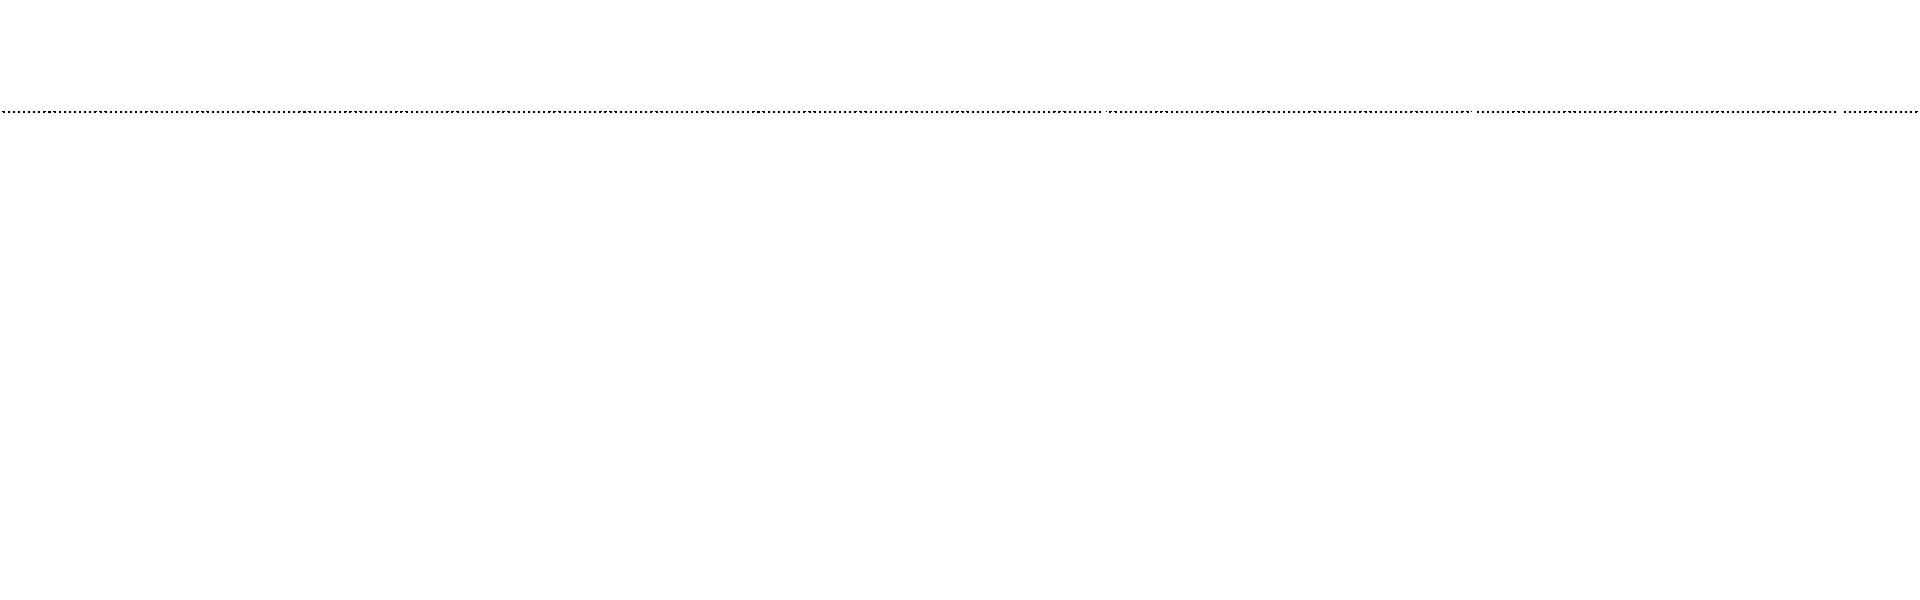 roadmap bg